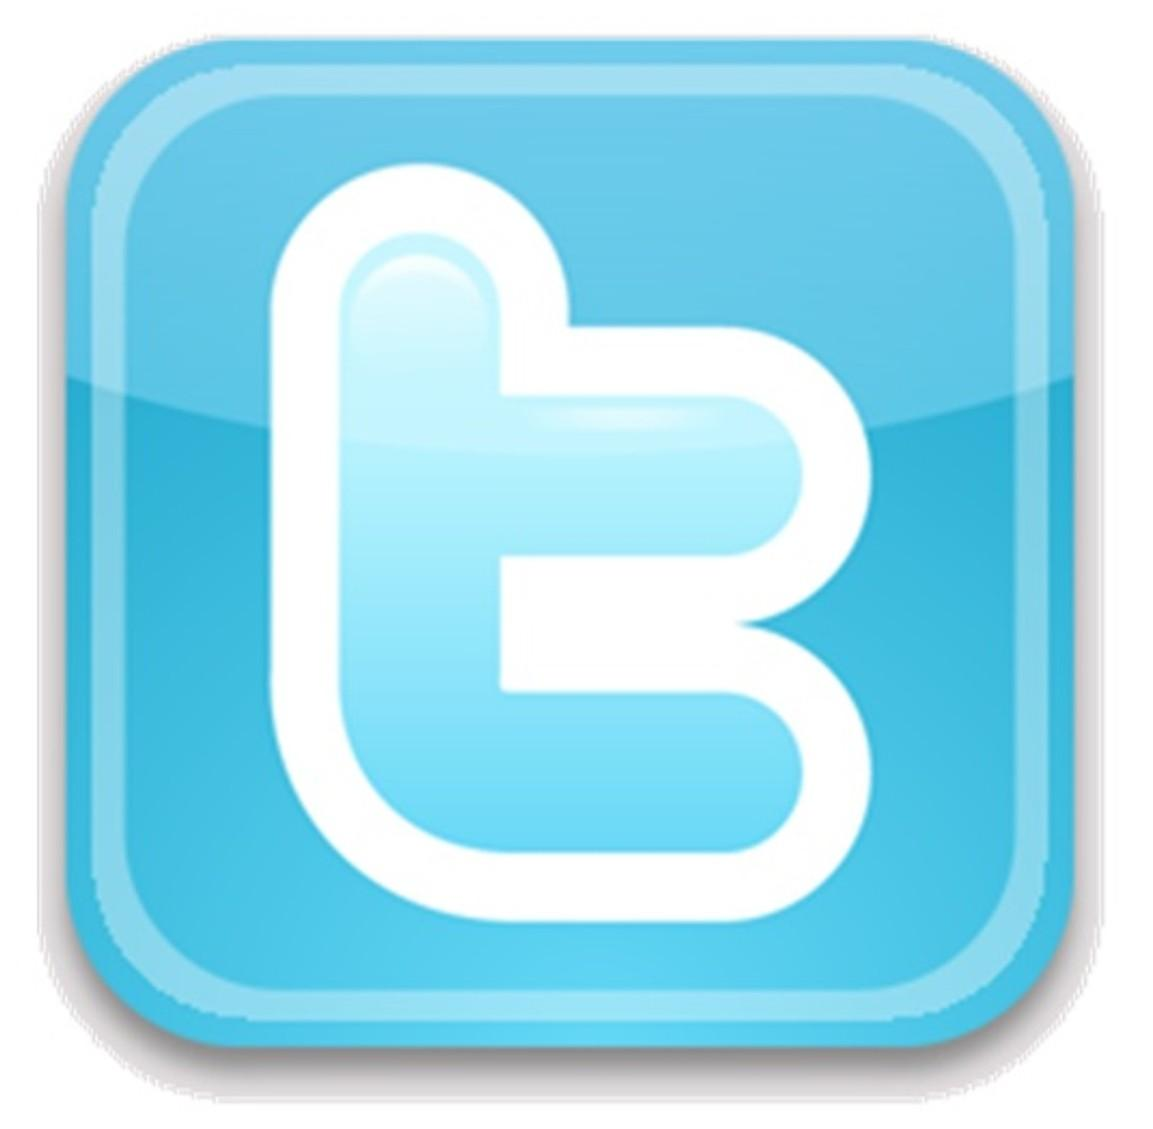 http://4.bp.blogspot.com/-Gvox-8glHoA/TpiJg-phdrI/AAAAAAAAAJU/bcTRapEQO0Q/s1600/twitter_logo.jpg